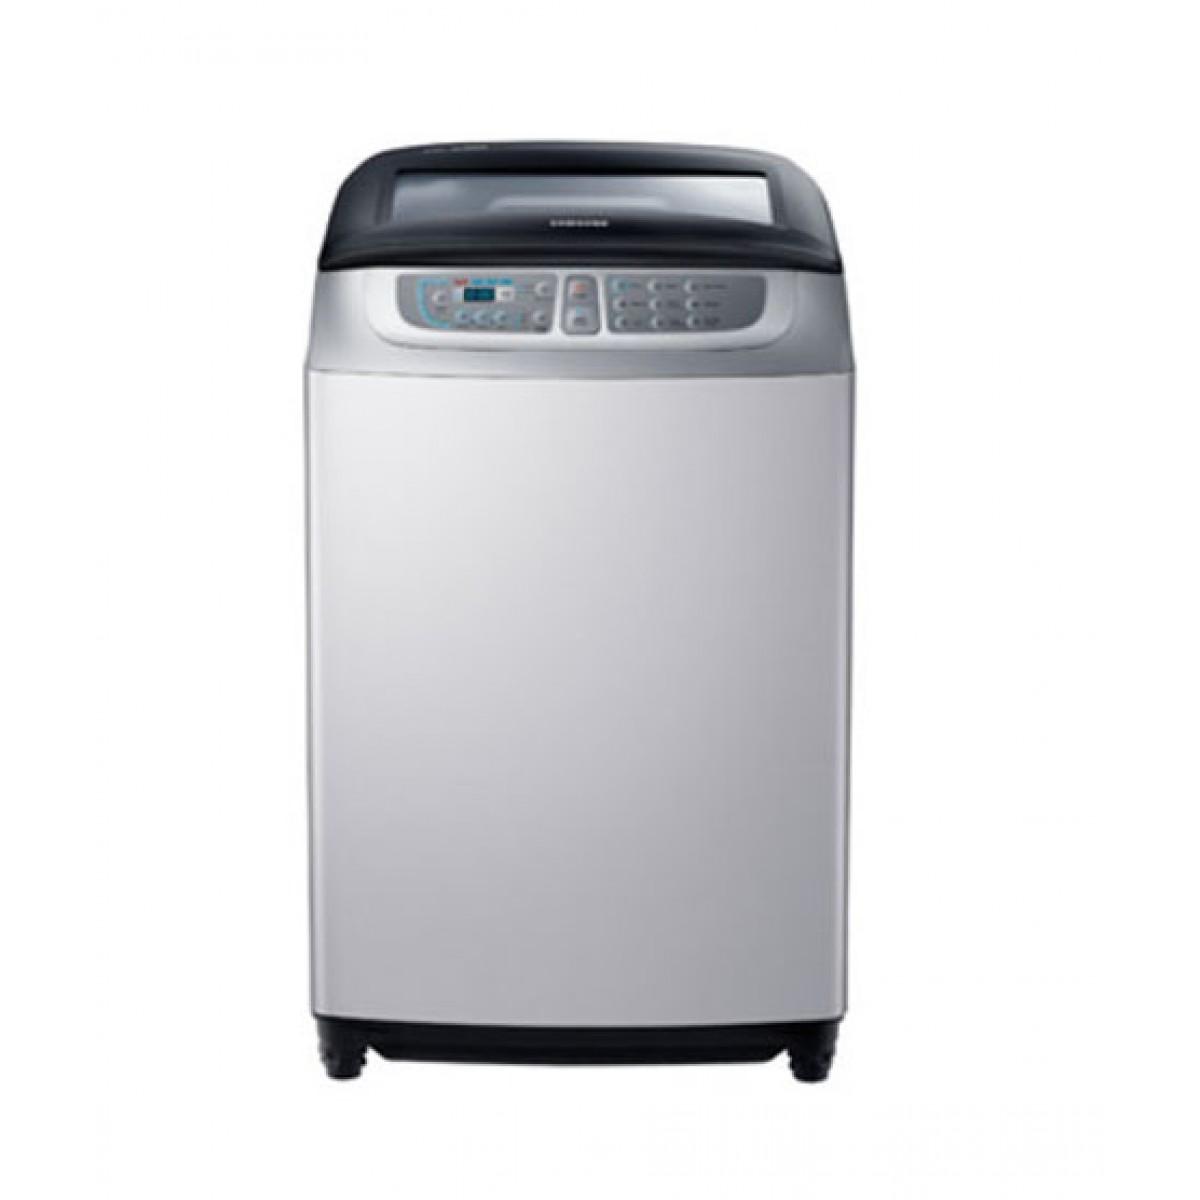 Samsung Washing Machine (WA90F5S2UWW) Price in Pakistan ...